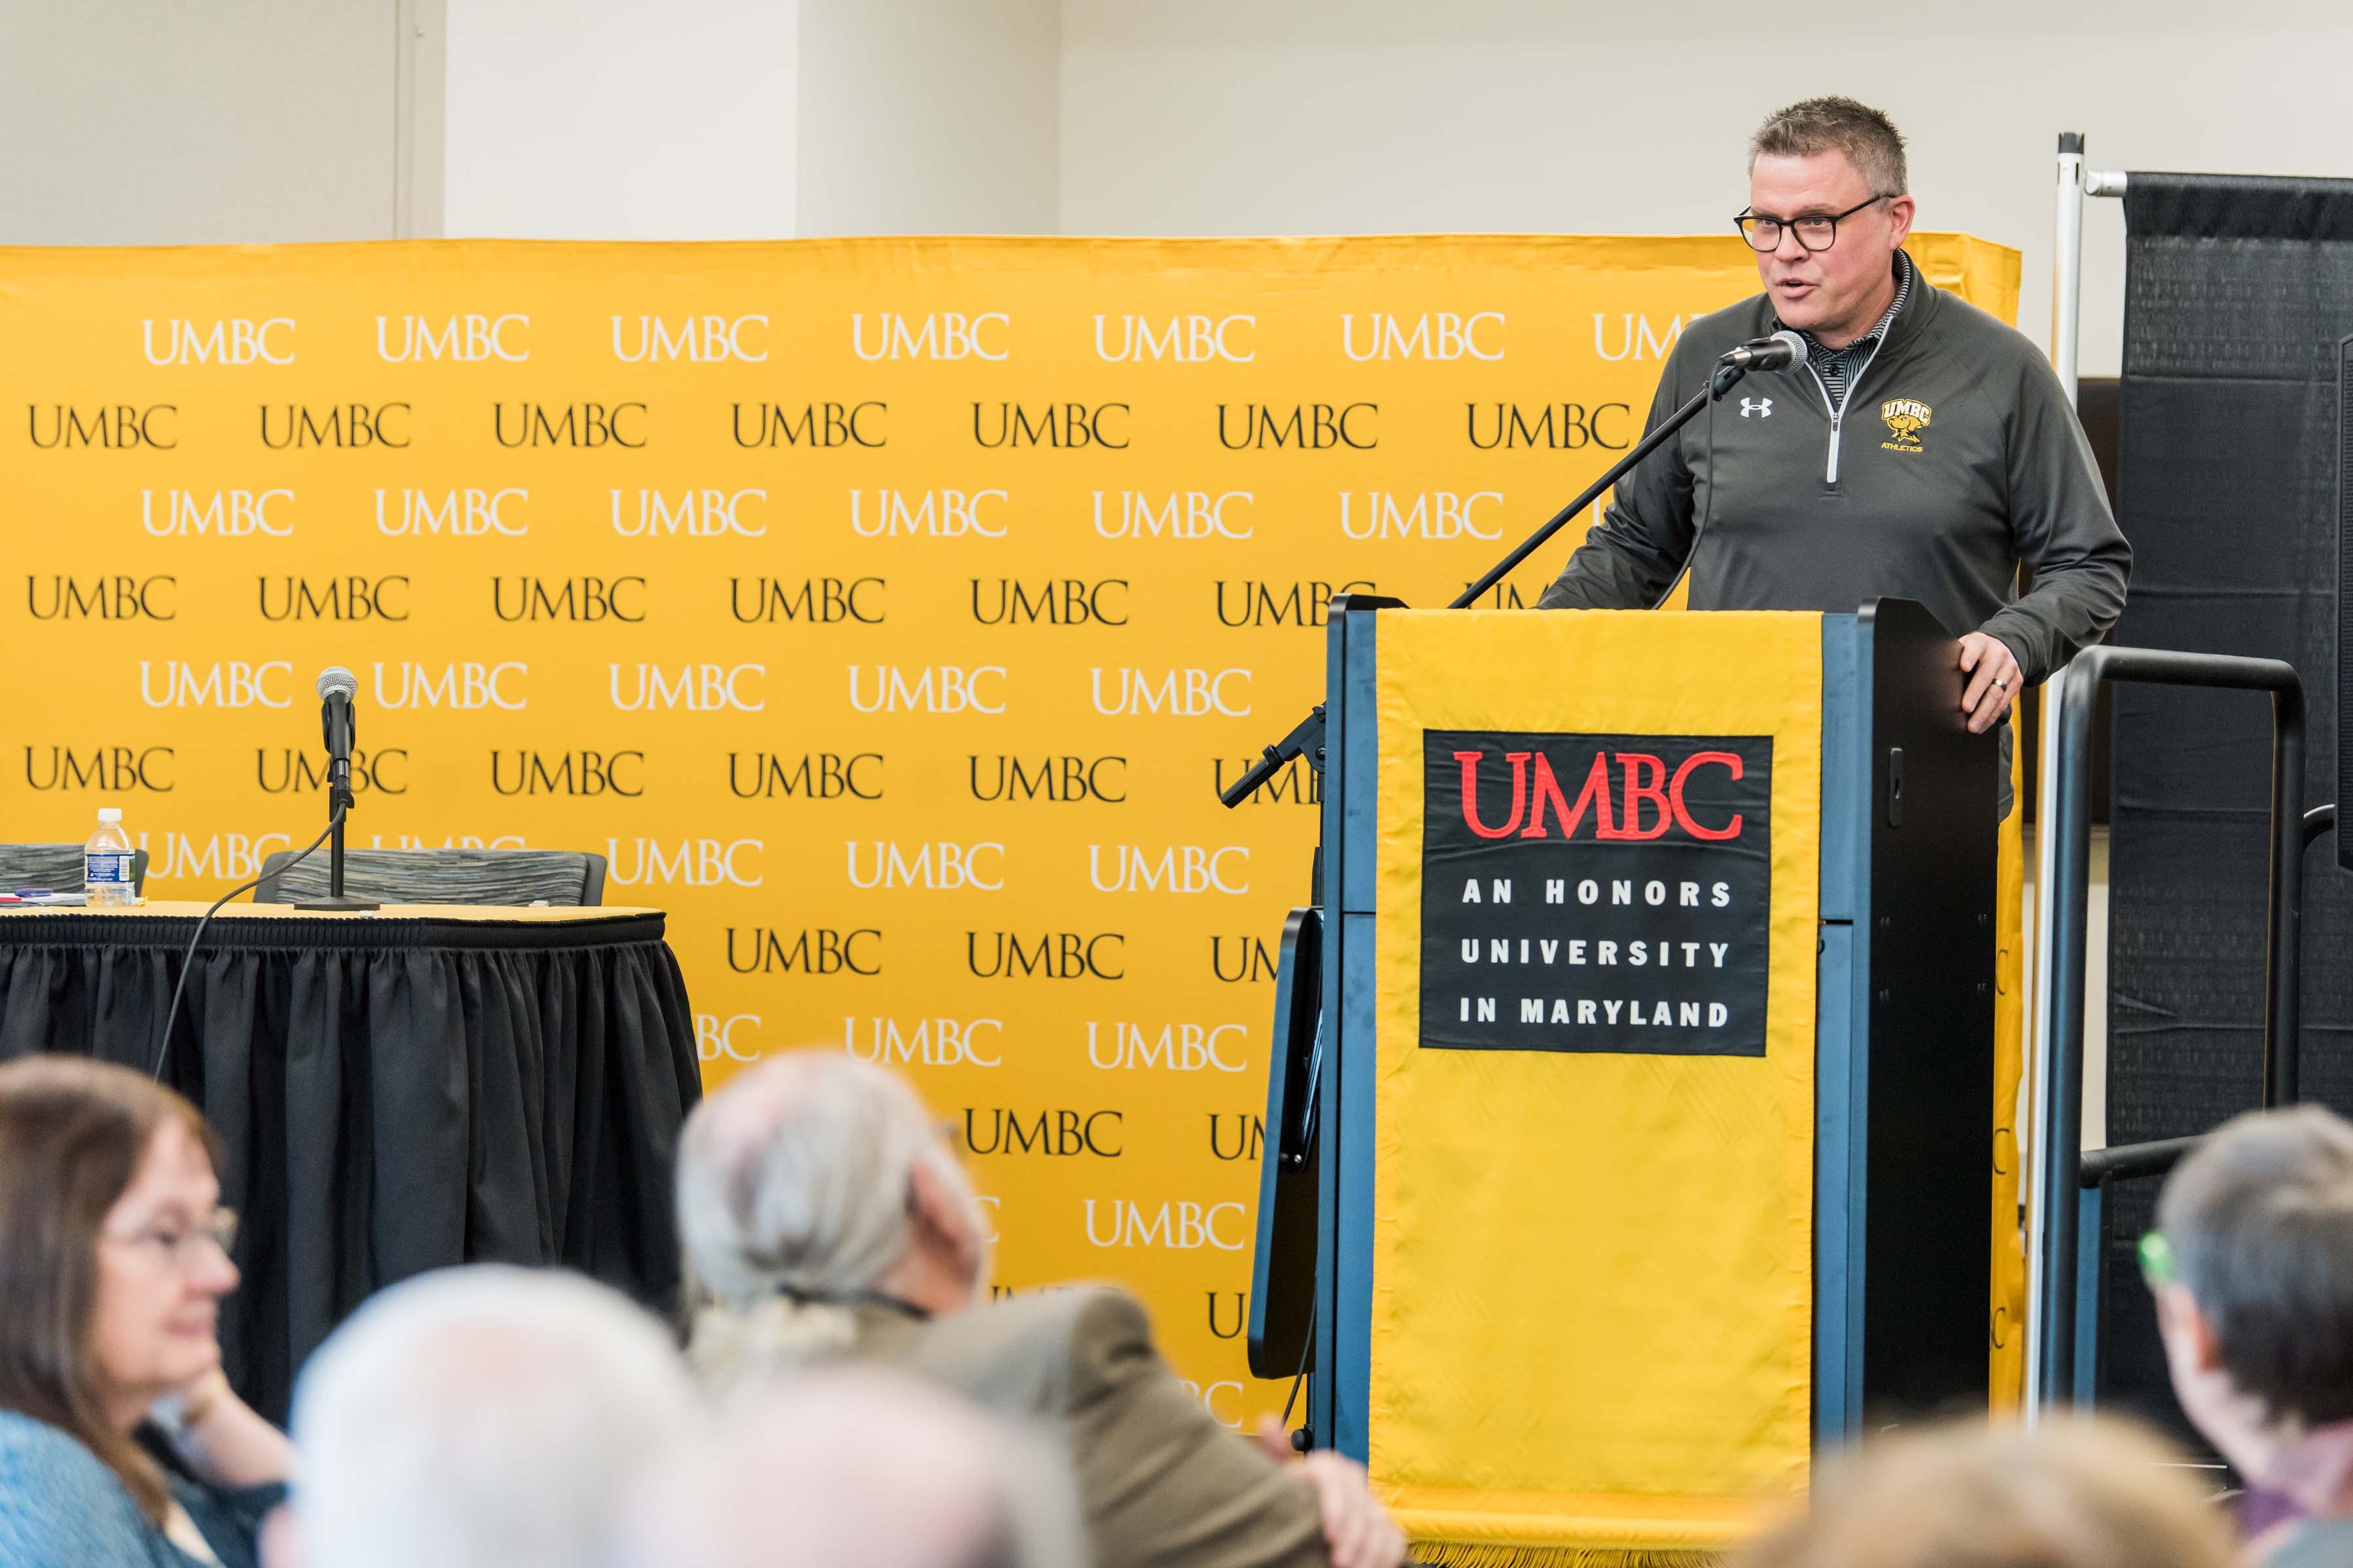 Man stands behind UMBC podium to talk